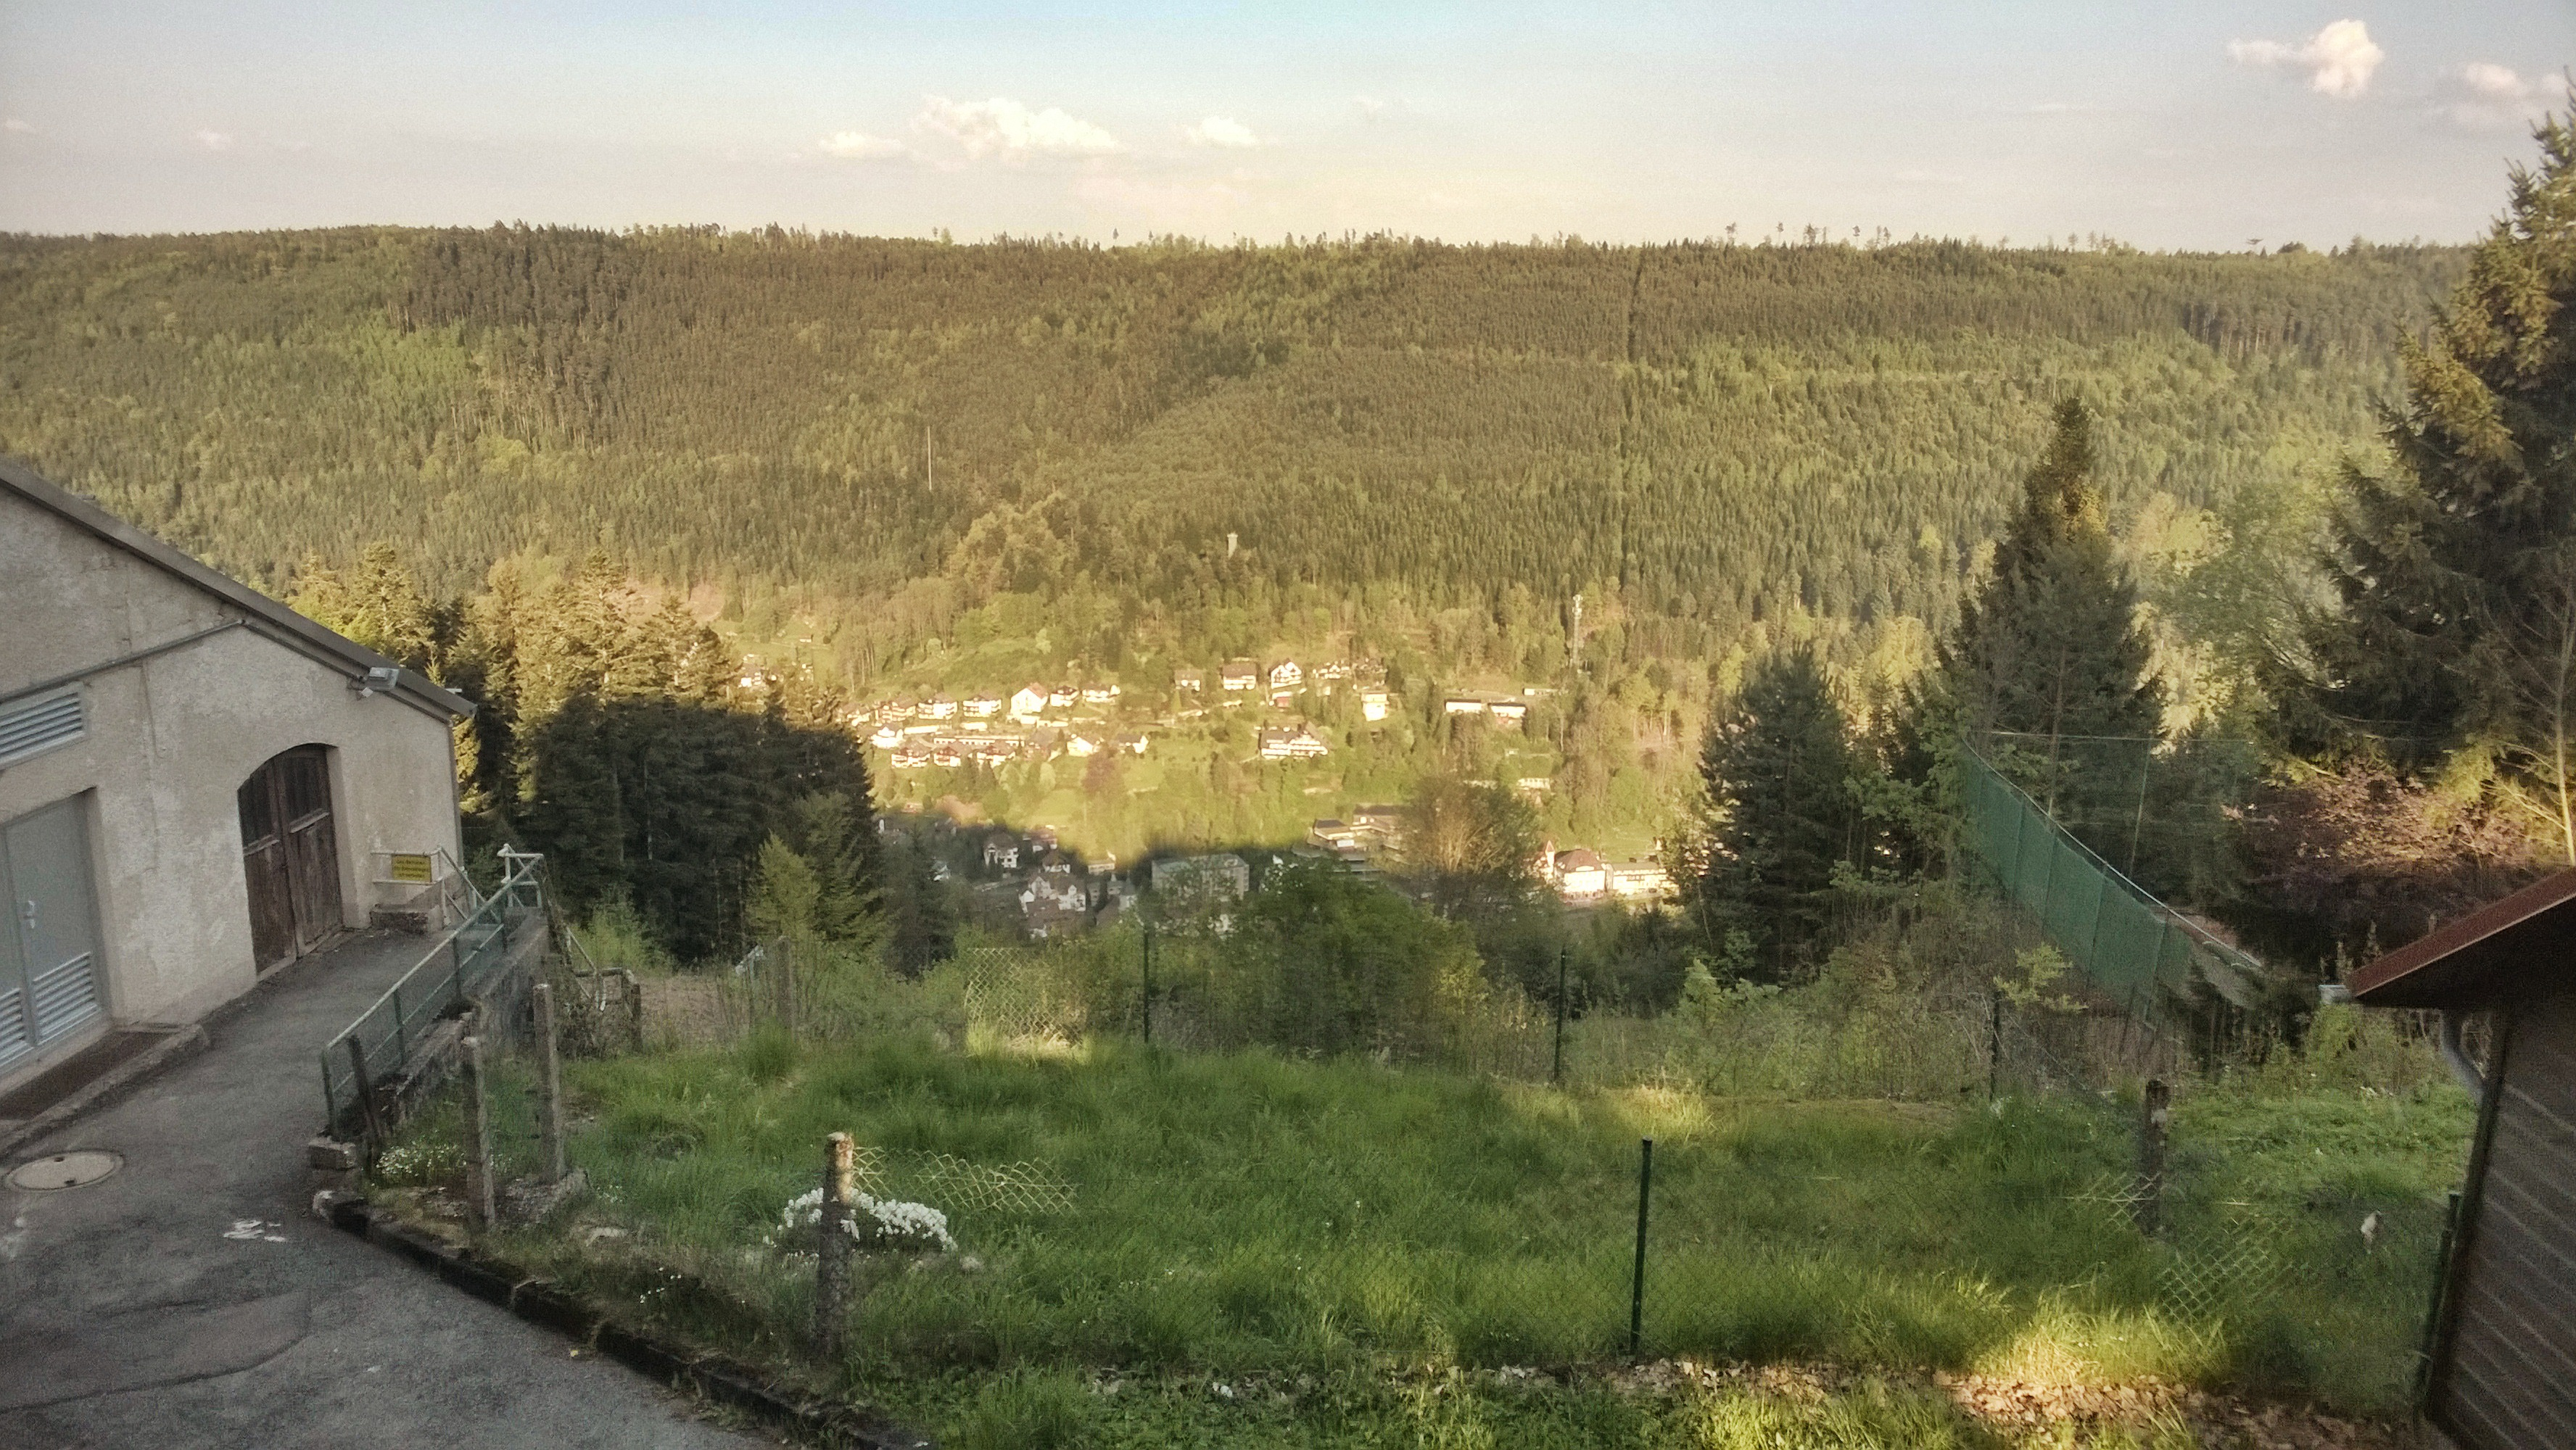 Schwarzwald, Trailrunning, Berg, Bad Wildbad